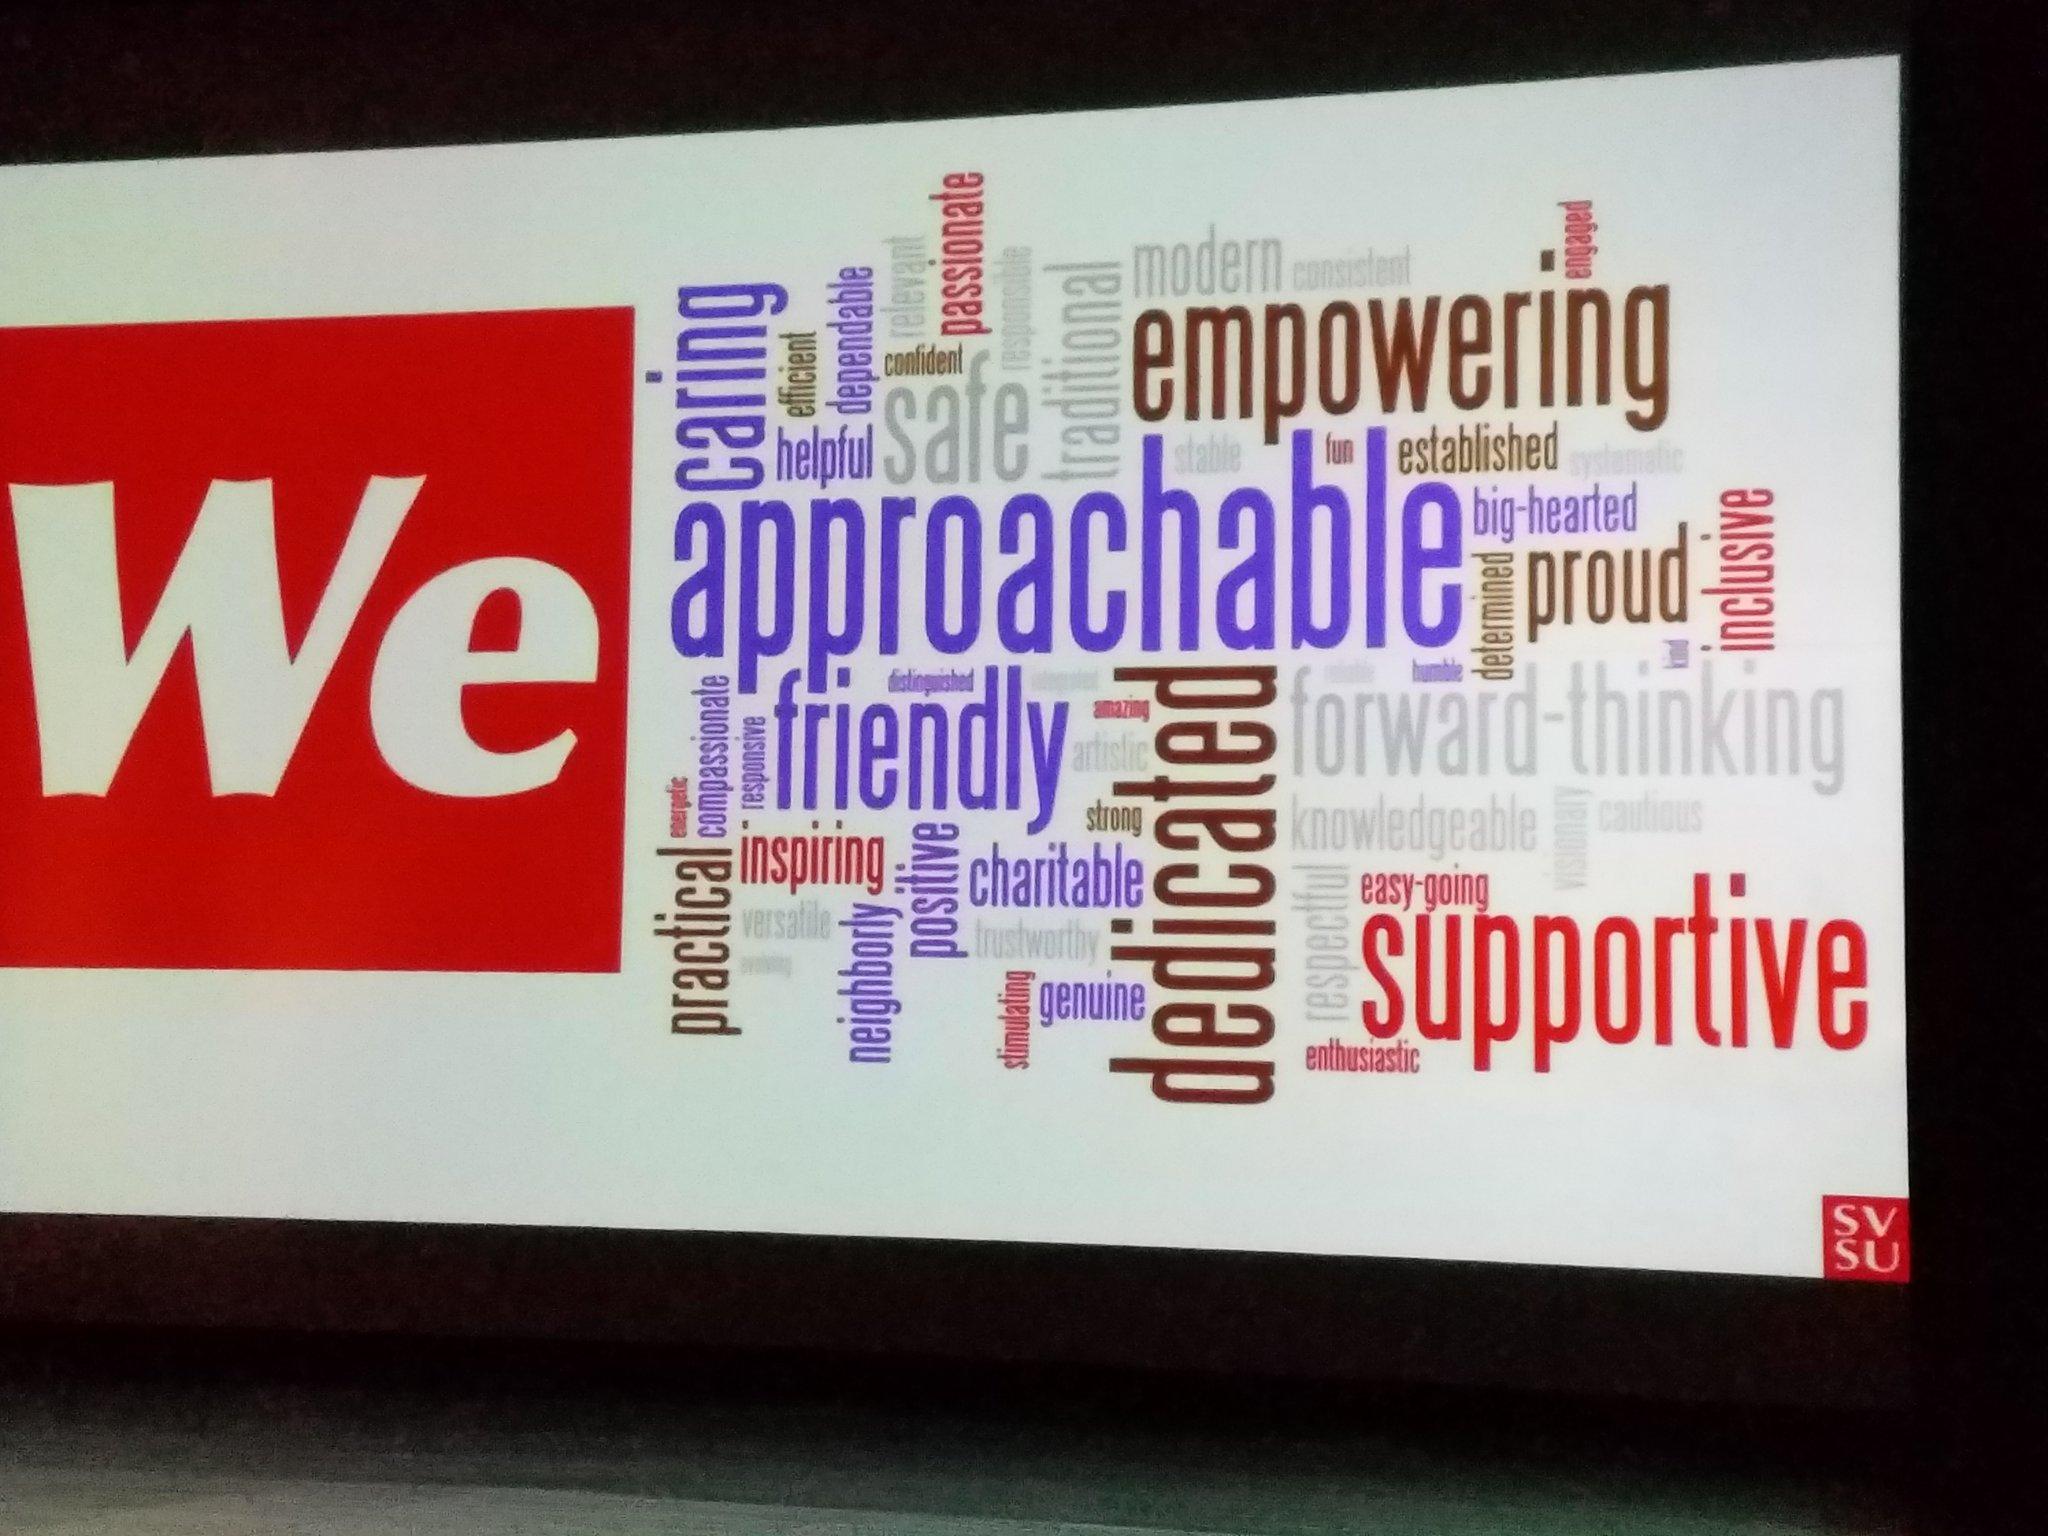 The power of 'we'!  State of the University address.  #svsu #wecardinal #redpride https://t.co/zKWN5lyNZ2